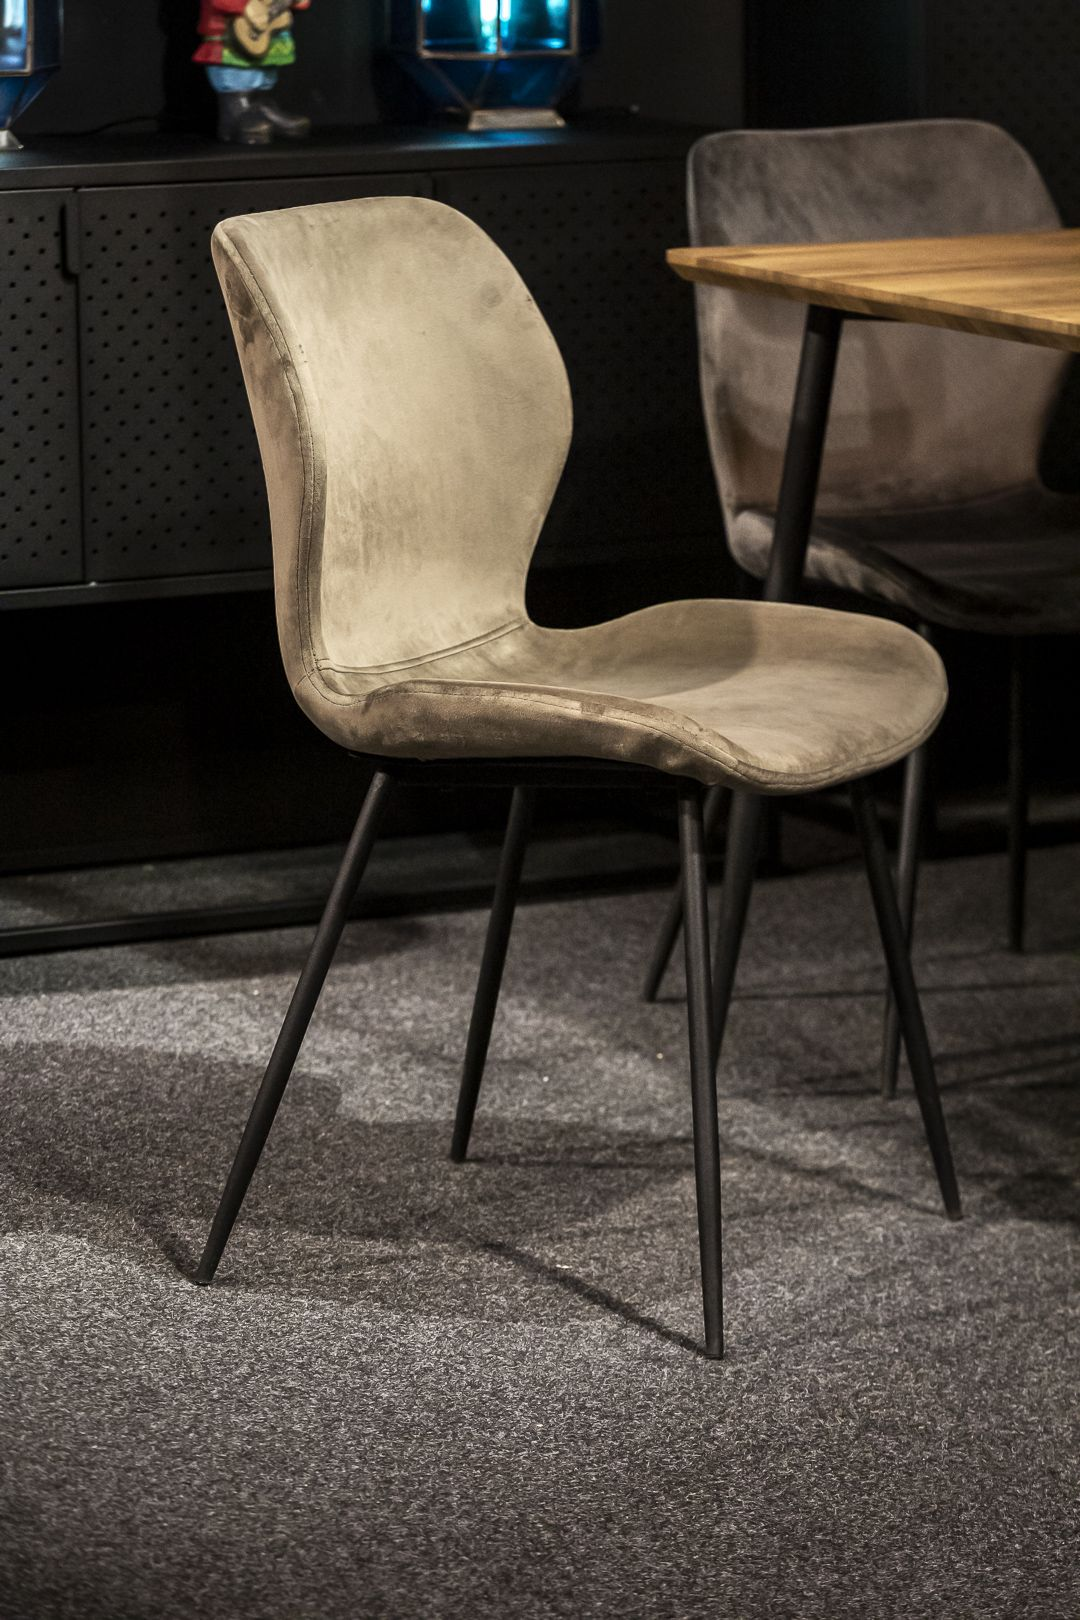 Stuhl Jordan Beige In 2020 Stuhle Haus Deko Esszimmerstuhle